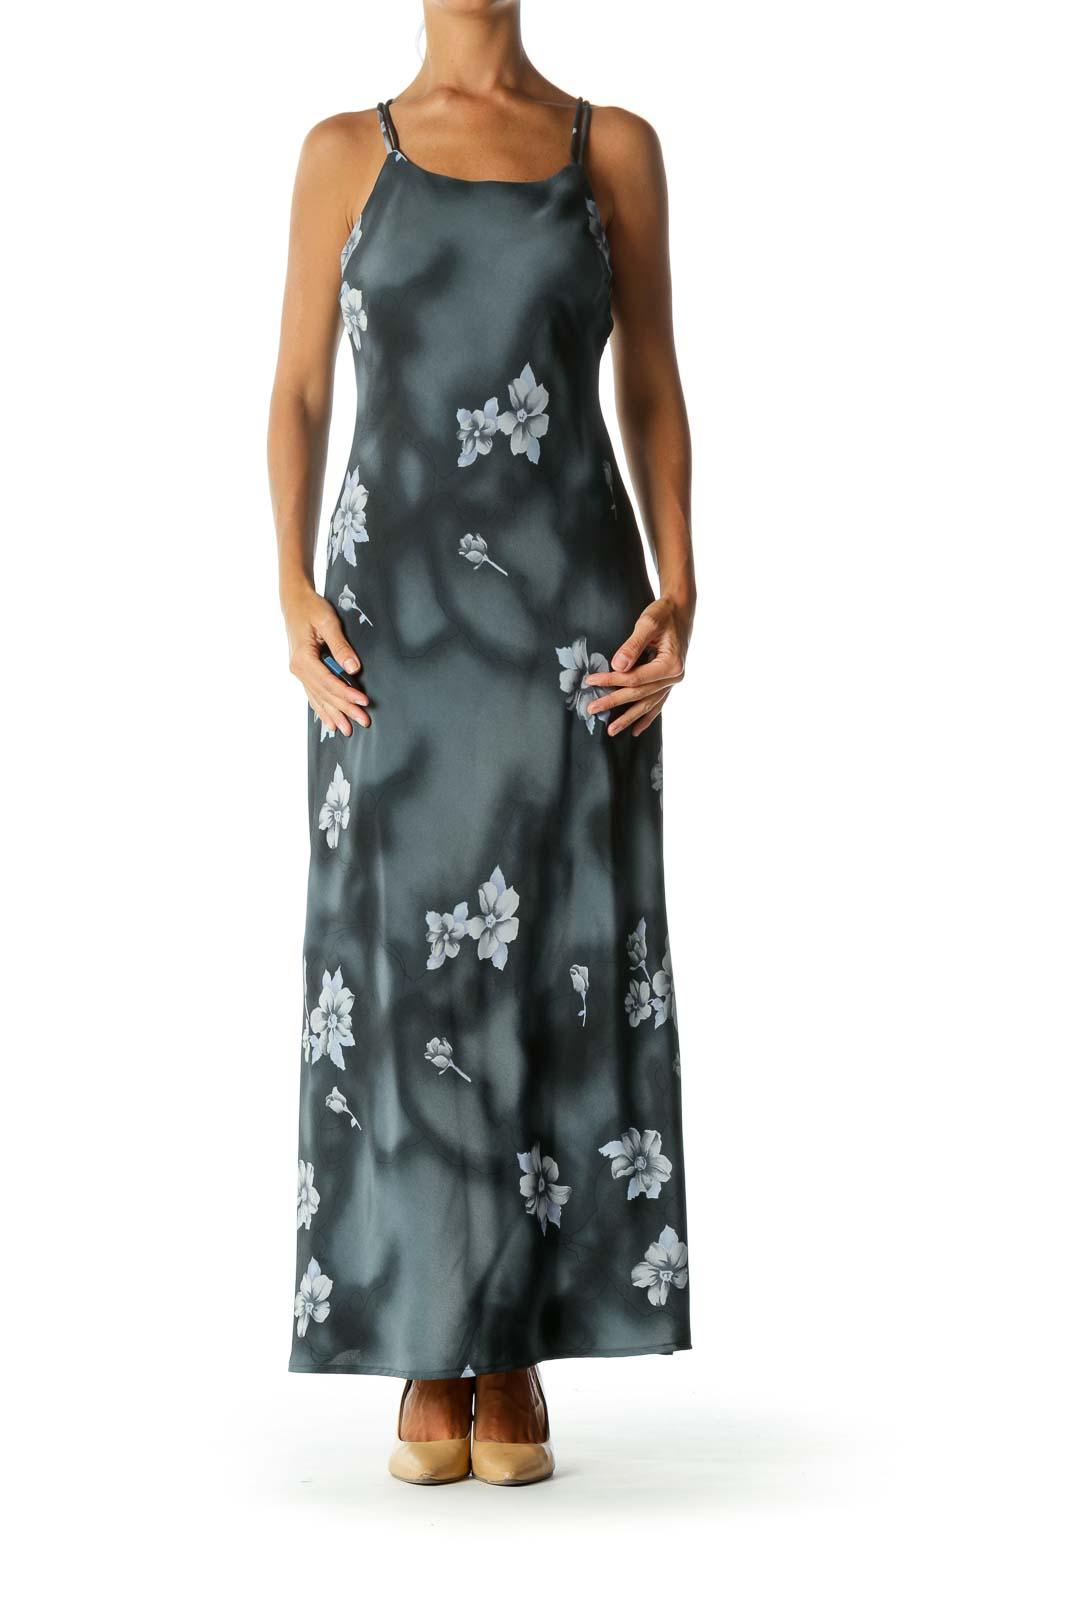 Navy Floral Spaghetti Strap Back-Detail Maxi Dress